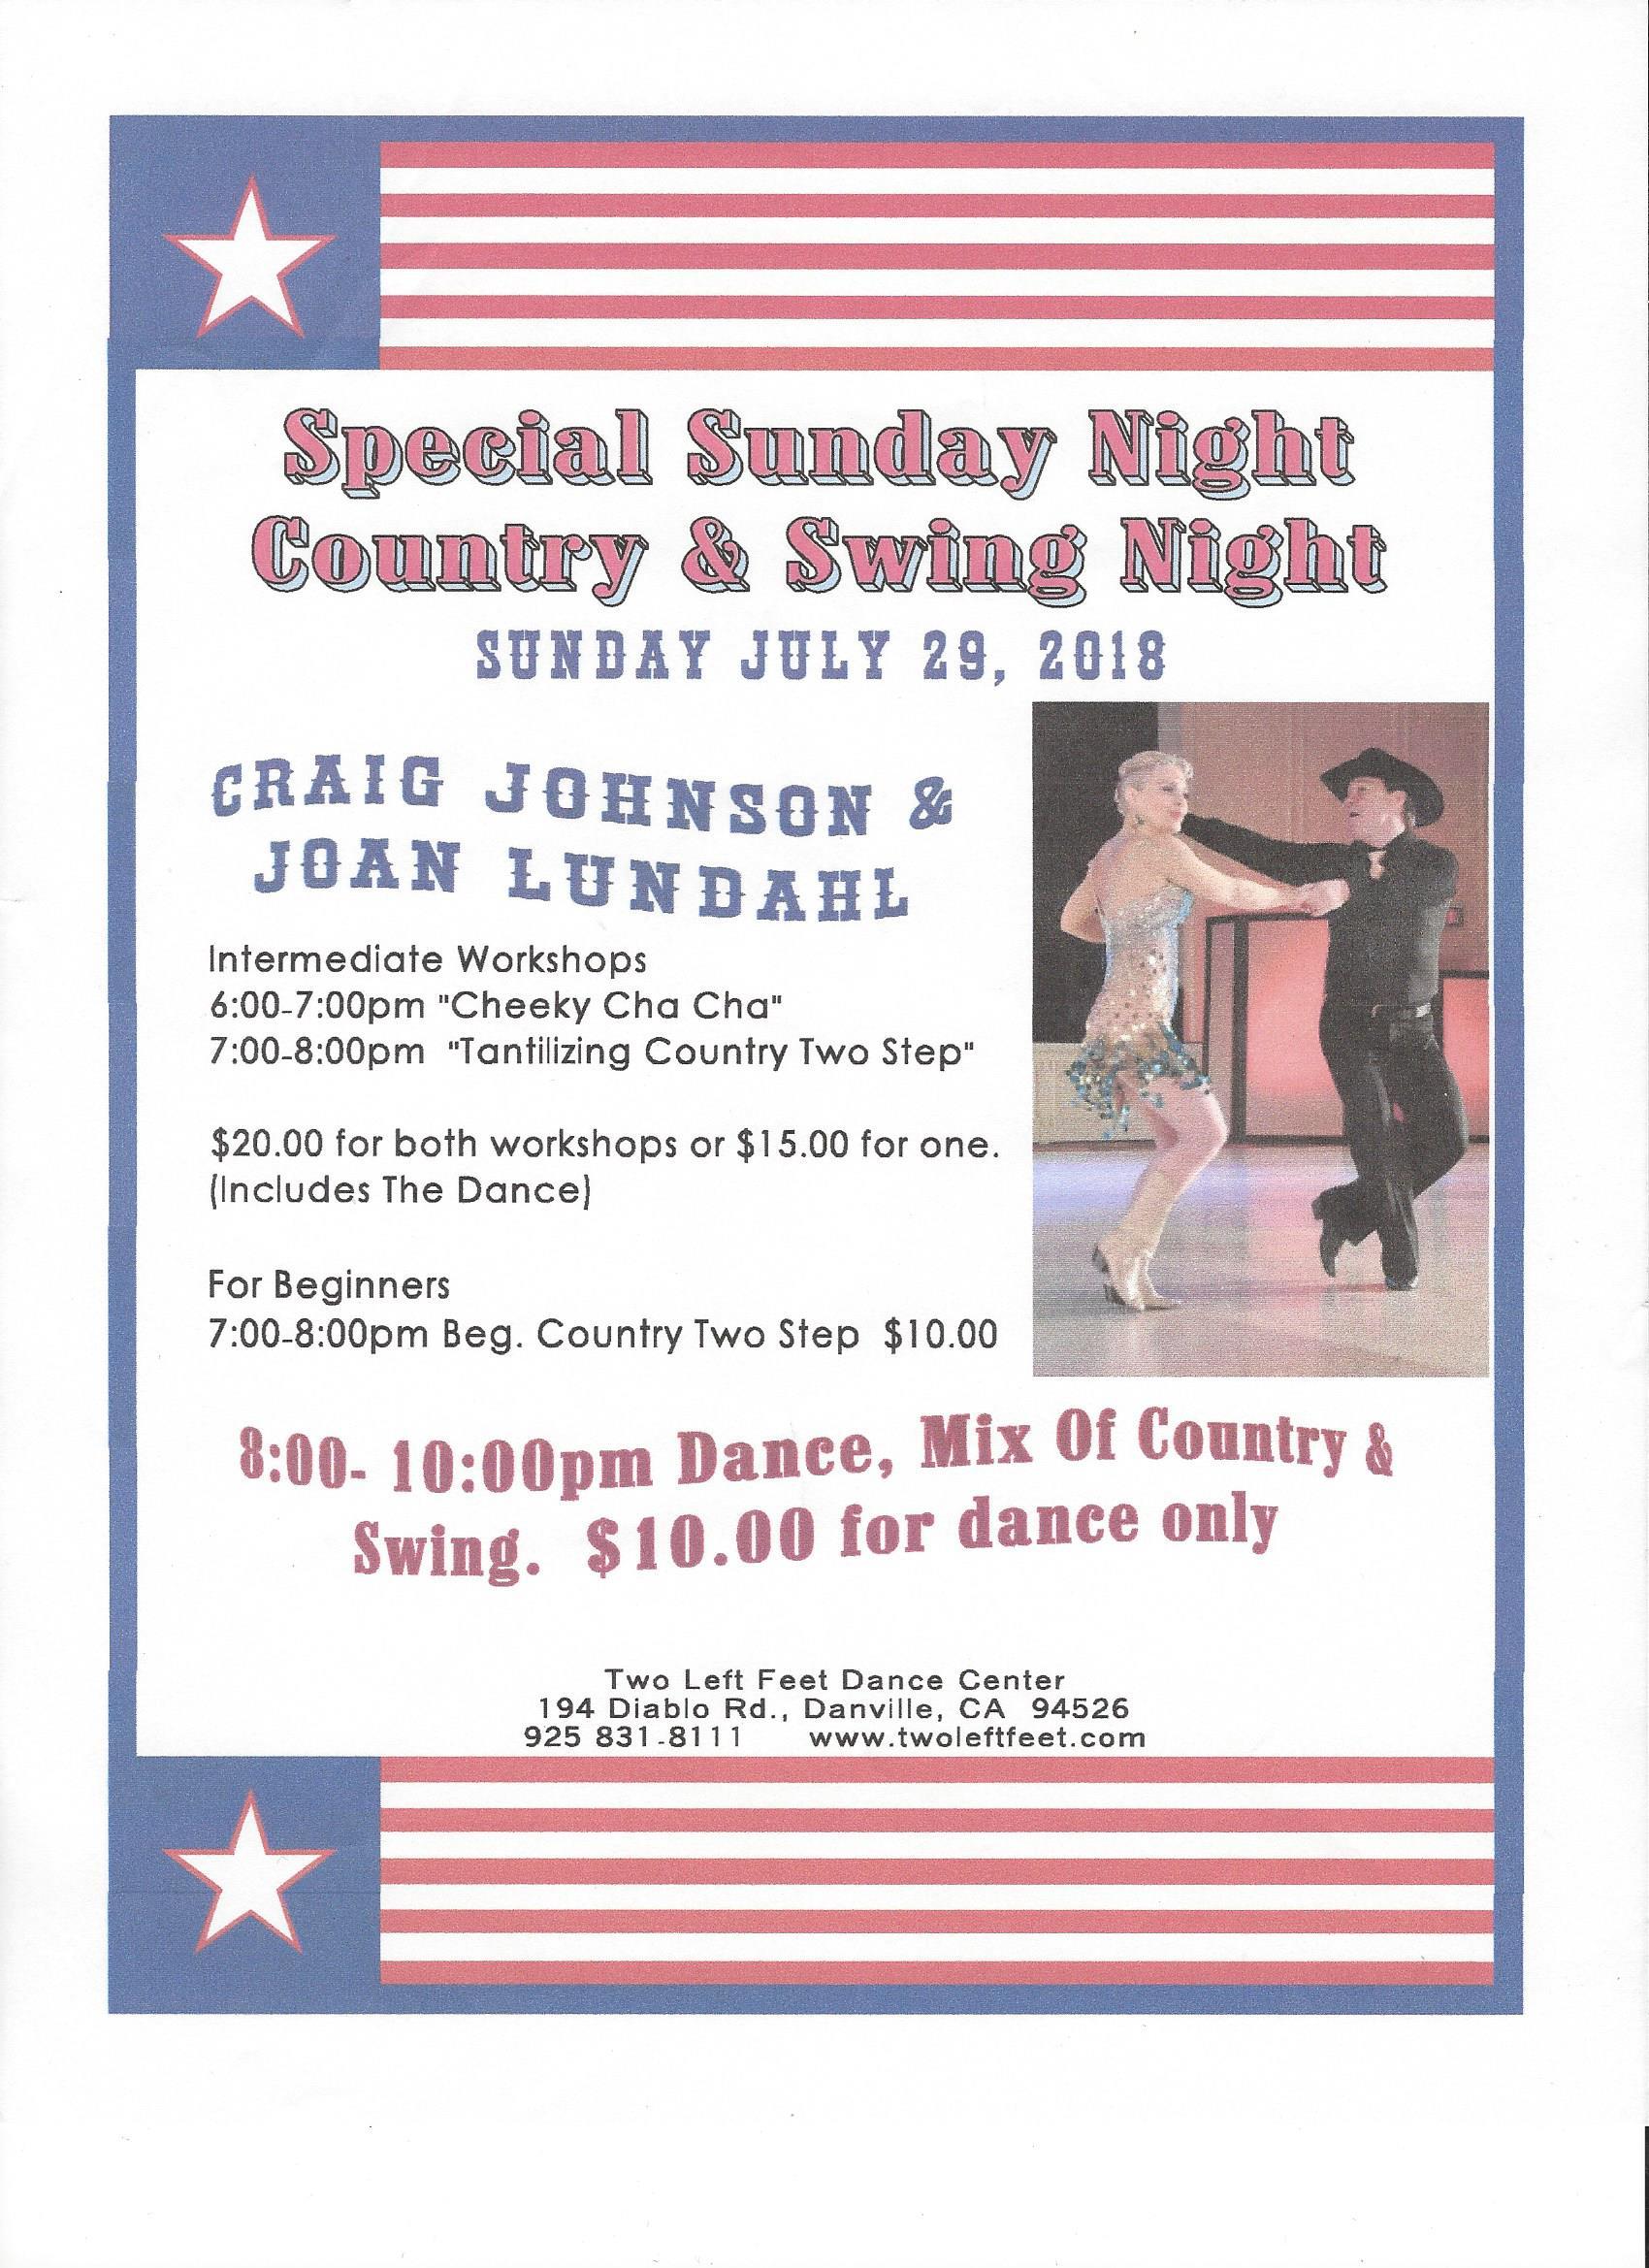 2018-07-29 Sunday Country & Swing night.jpg